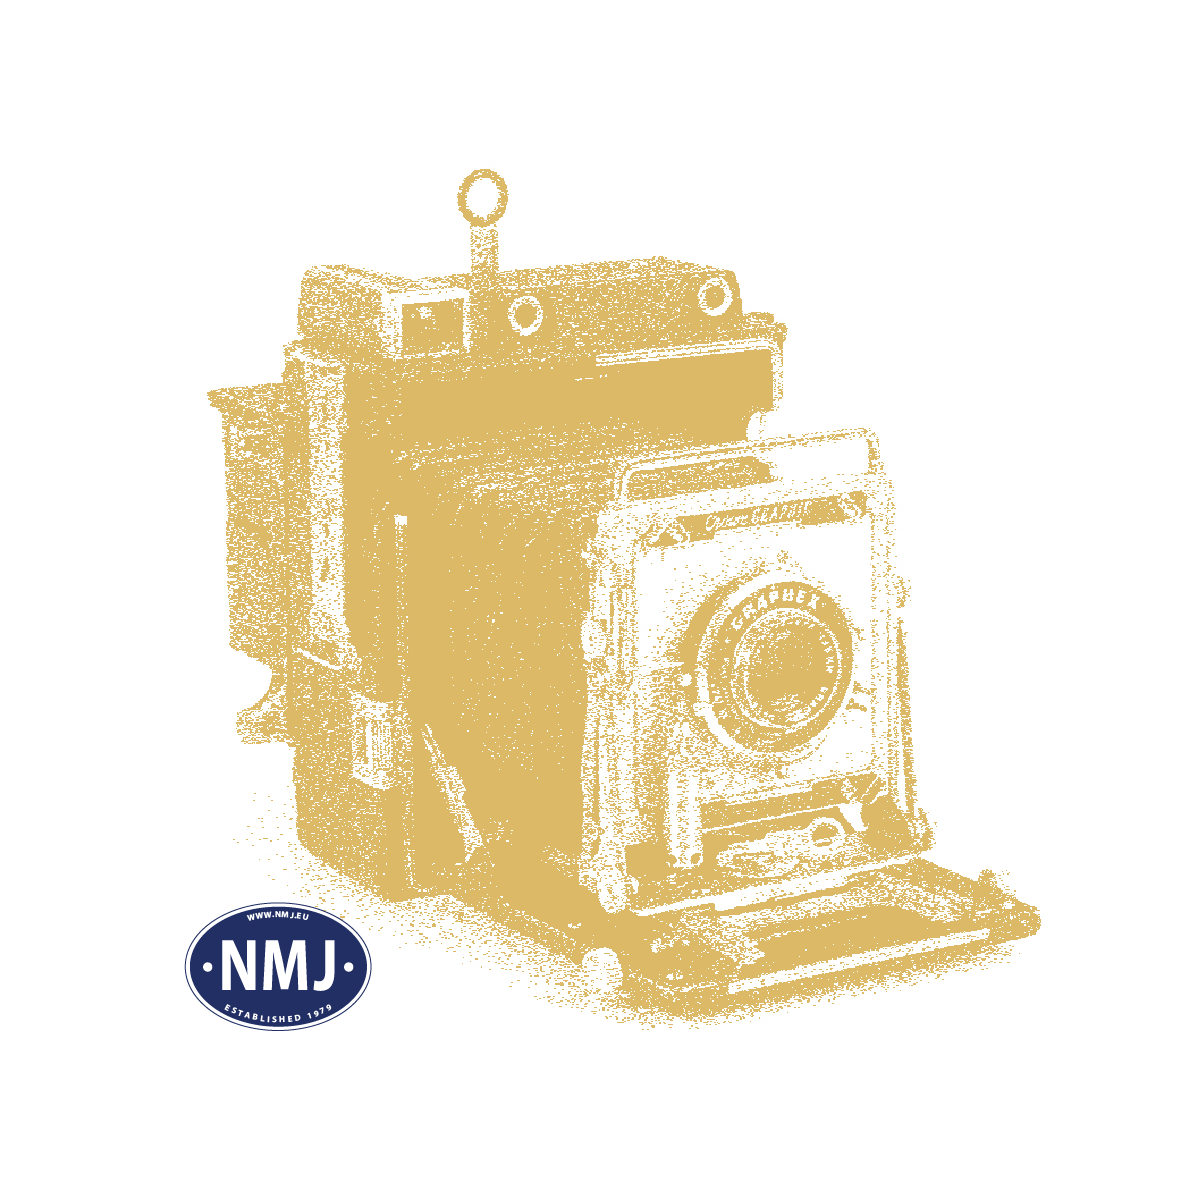 ESU64610 - Lokpilot Decoder V4.0 M4, NEM 652